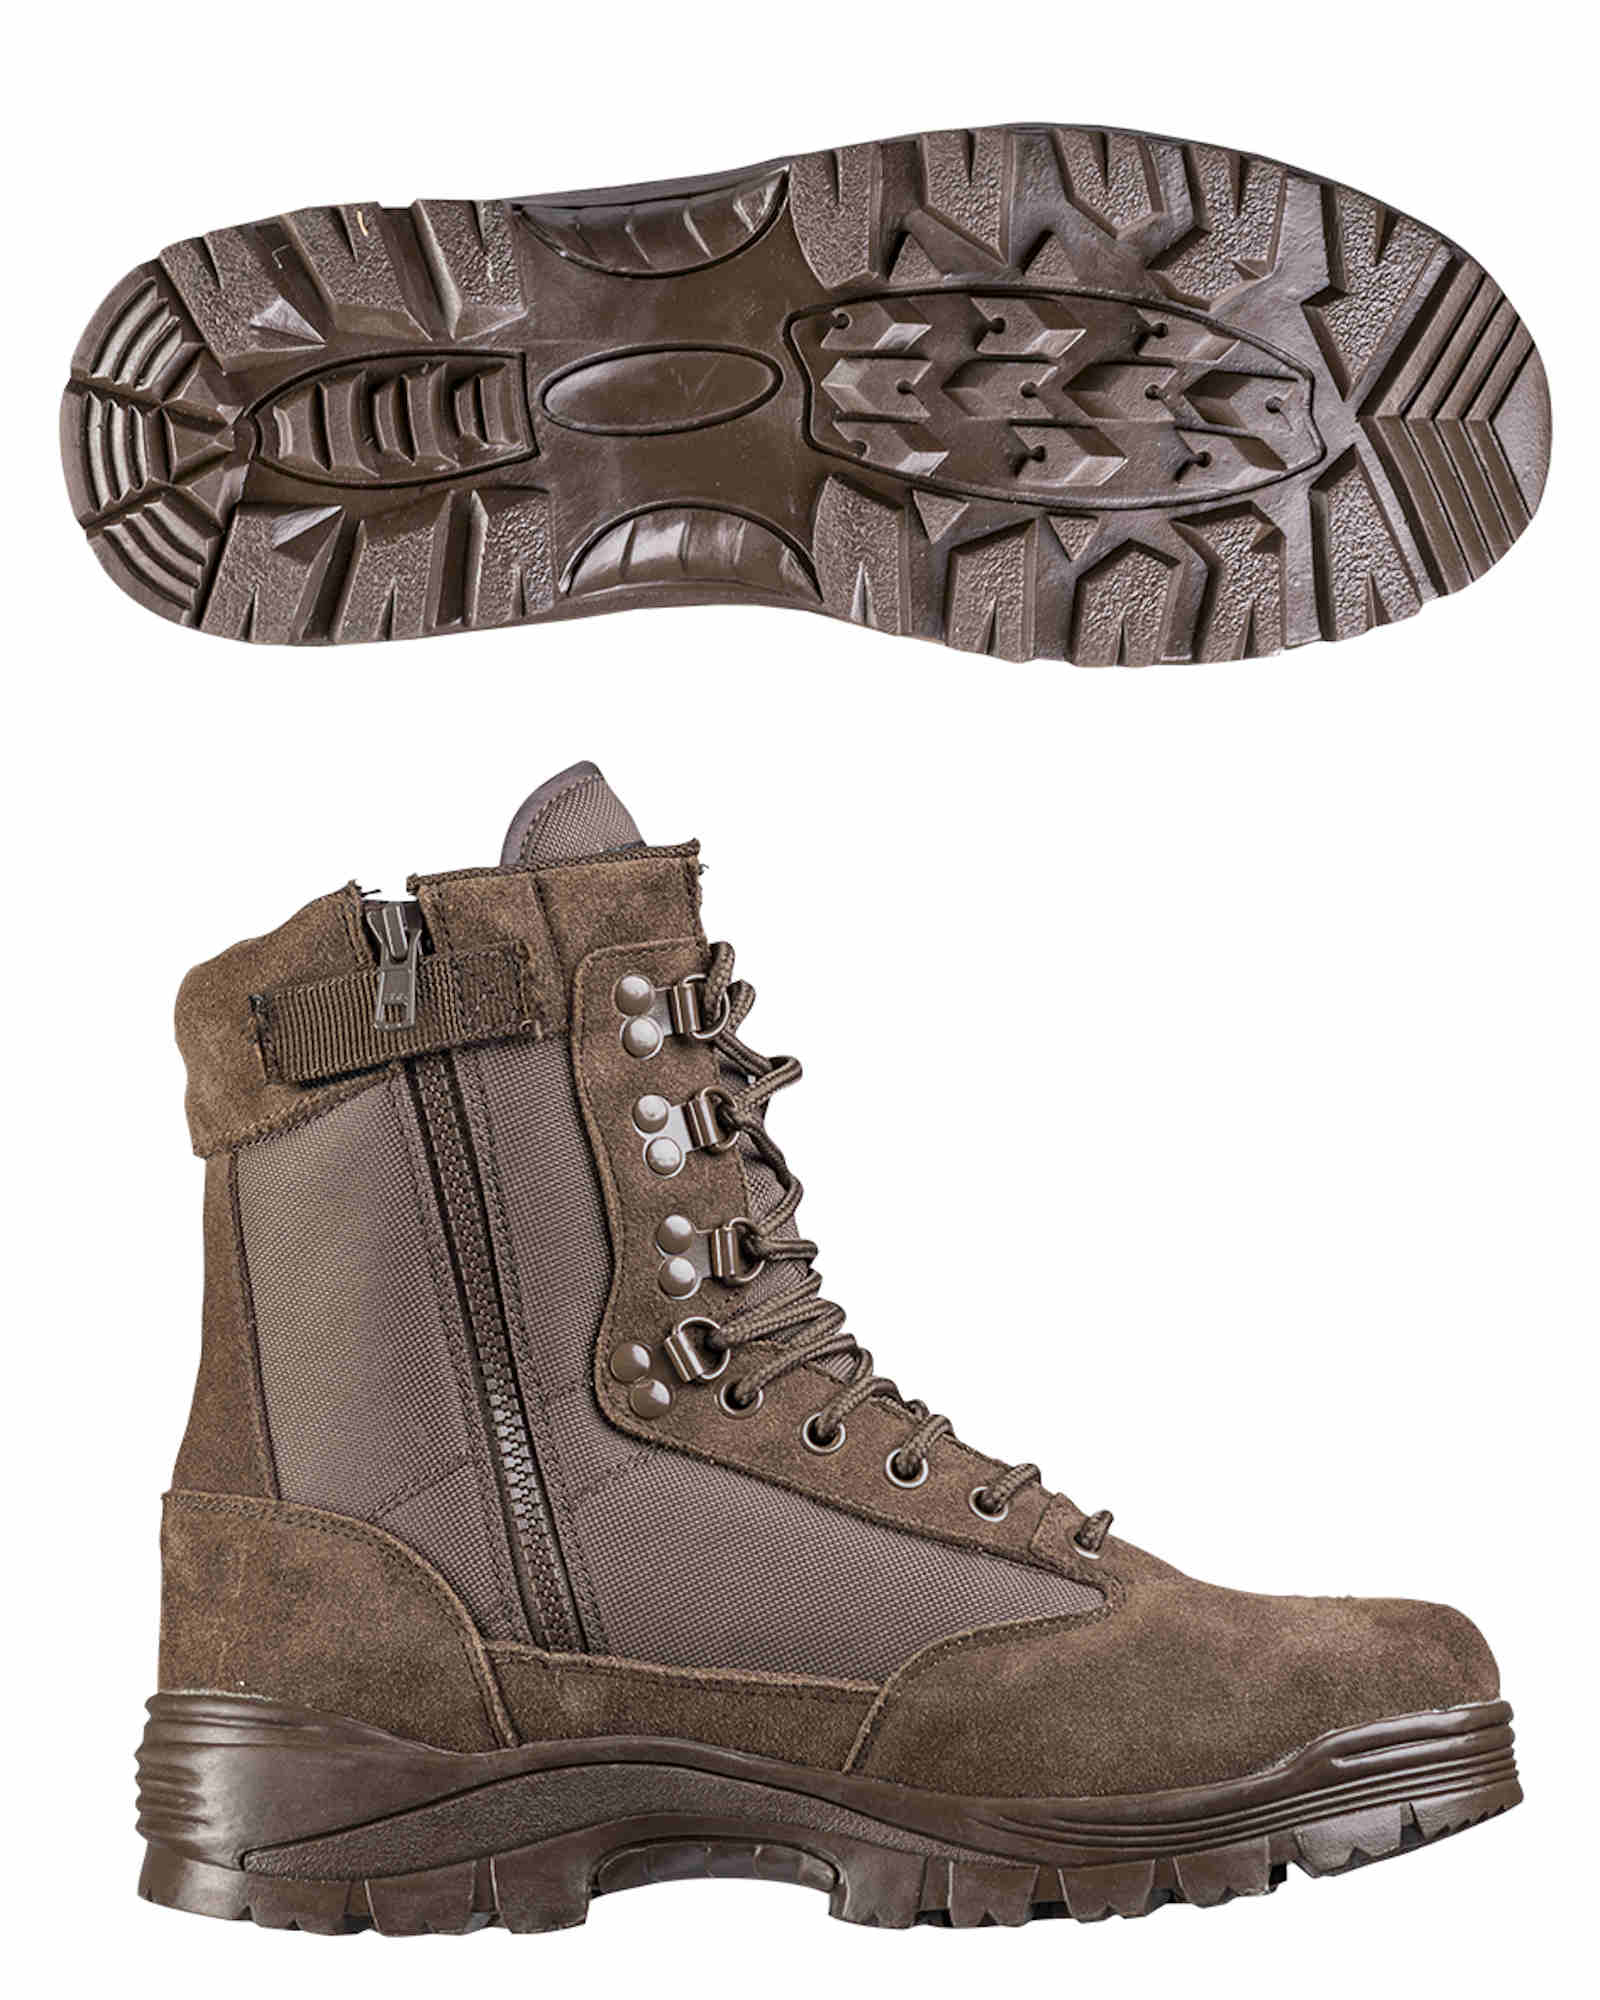 Mil-Tec TACTICAL BOOT M.YKK ZIPPER SCHWARZ Stiefel Schuhe